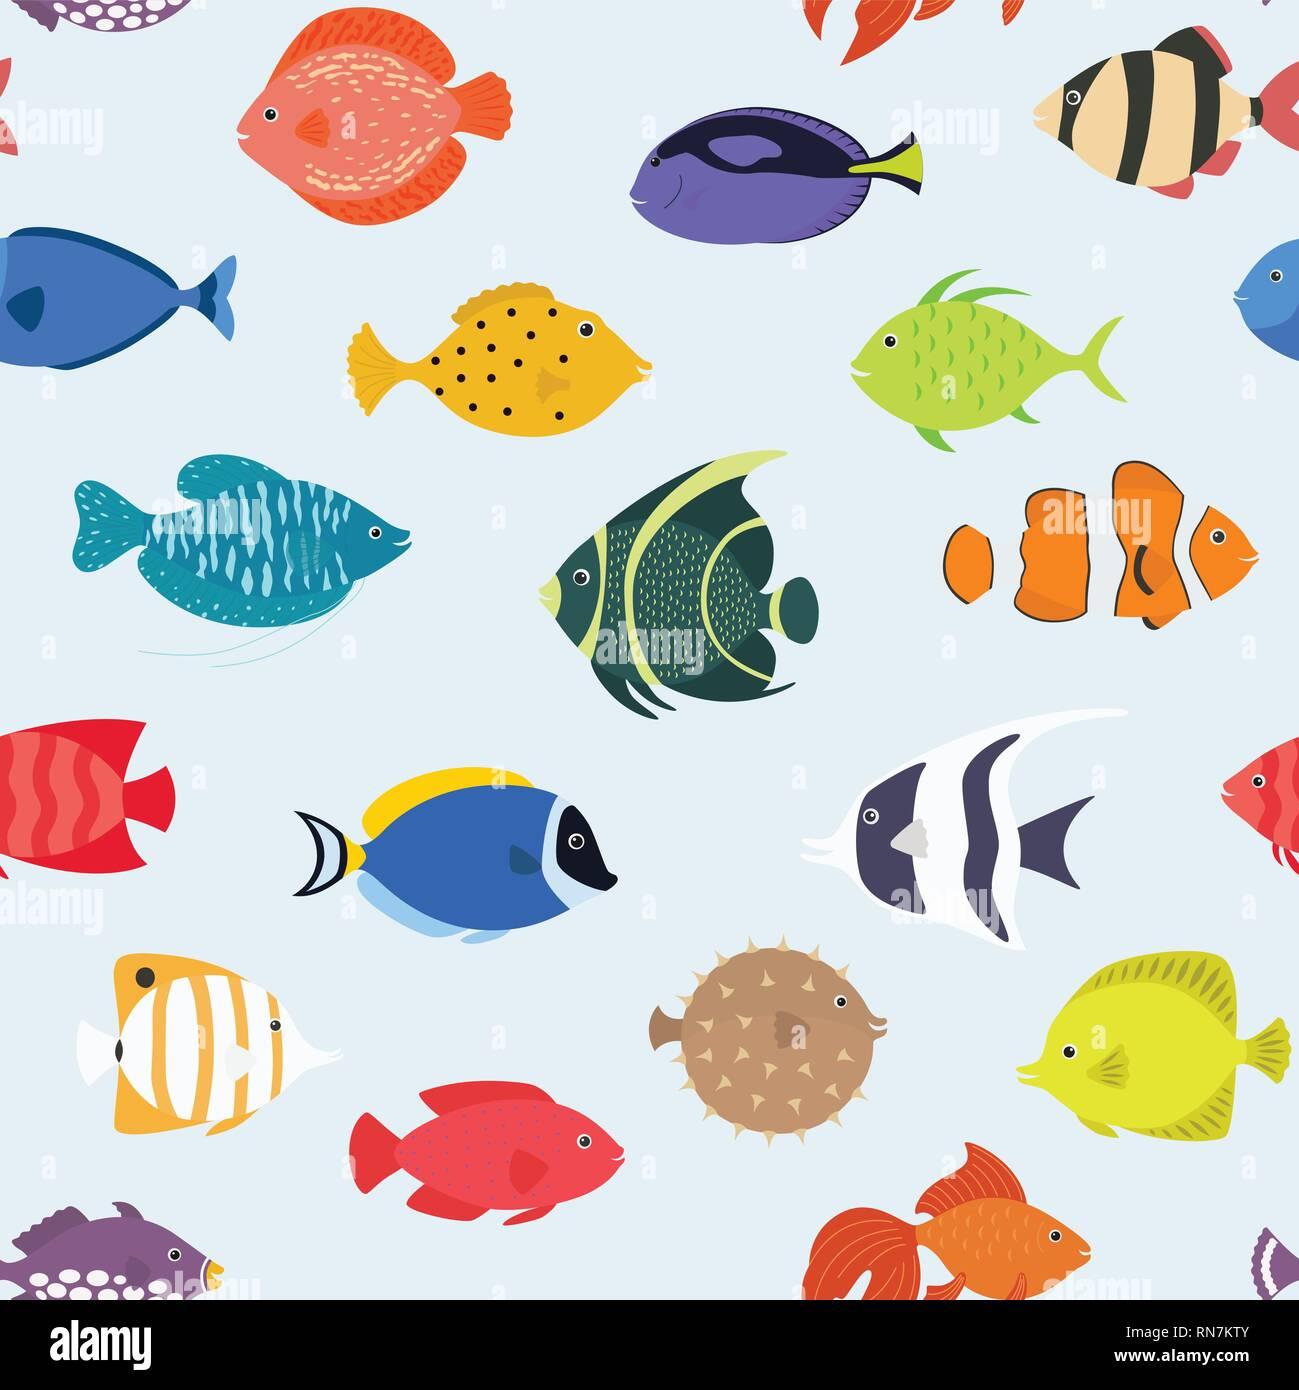 Underwater World Stock Vector Images